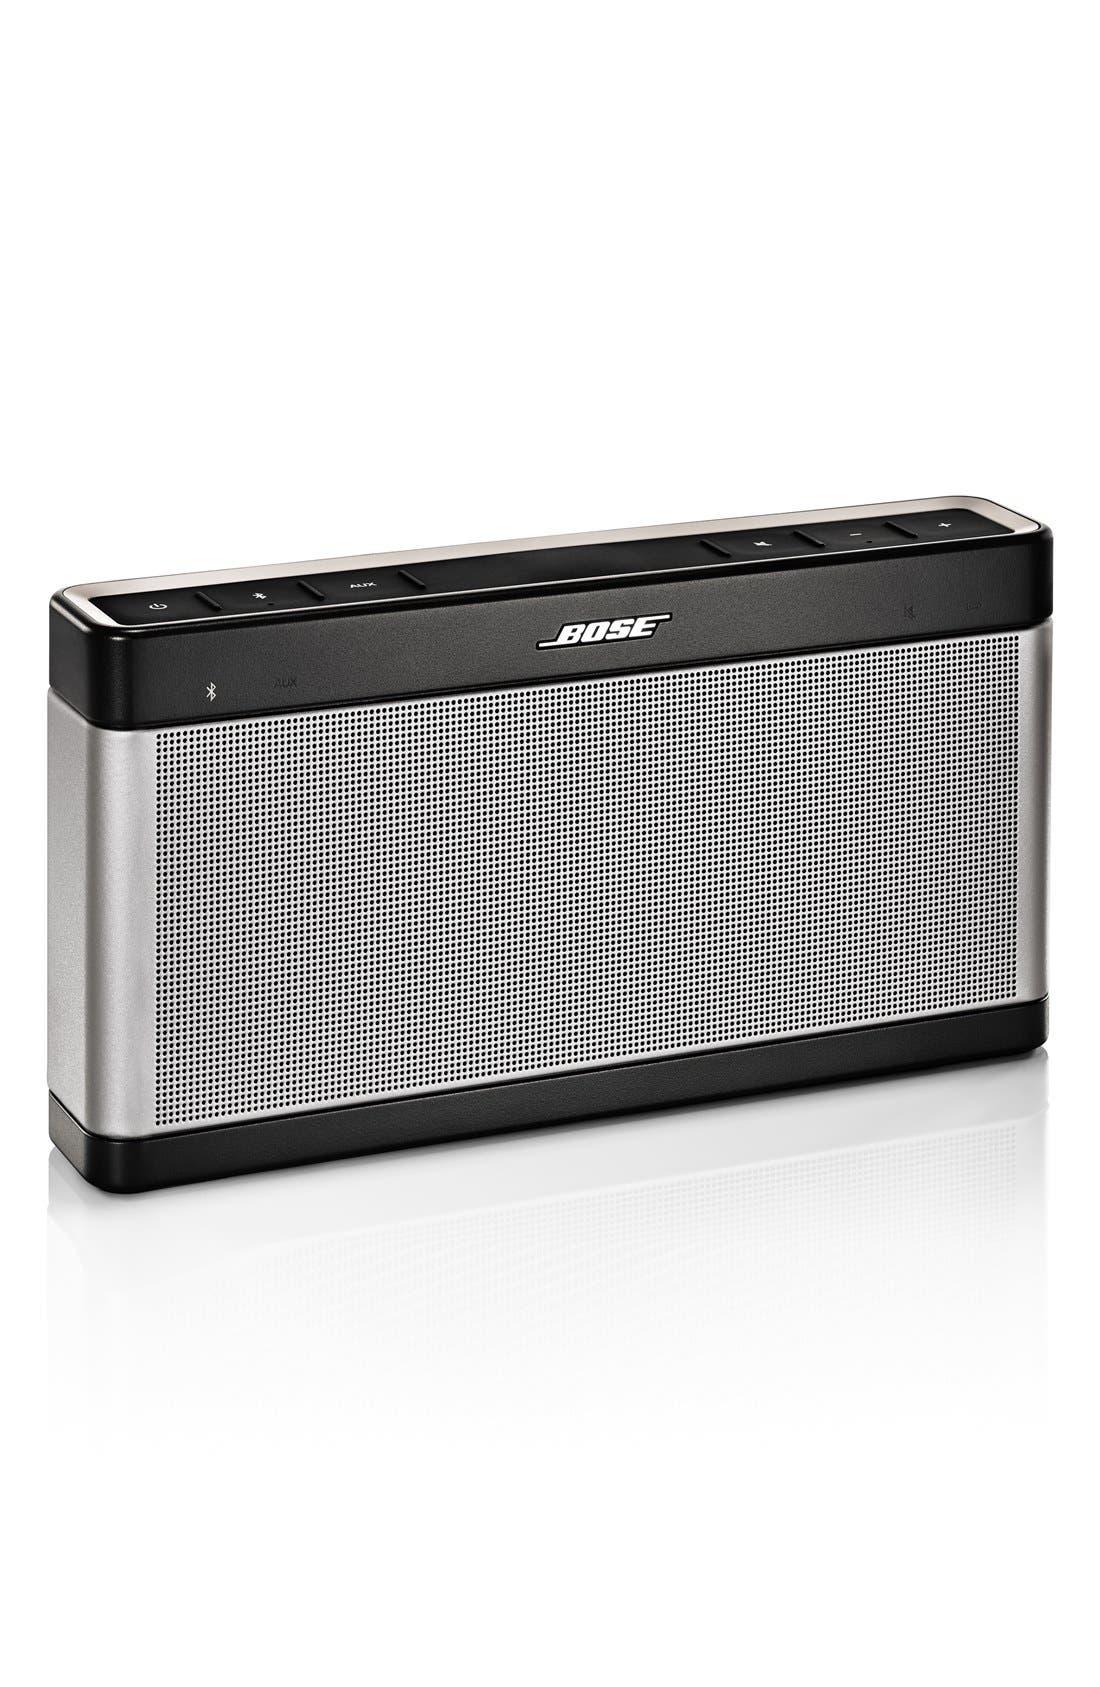 Alternate Image 1 Selected - Bose® SoundLink® Bluetooth® Mobile Speaker III